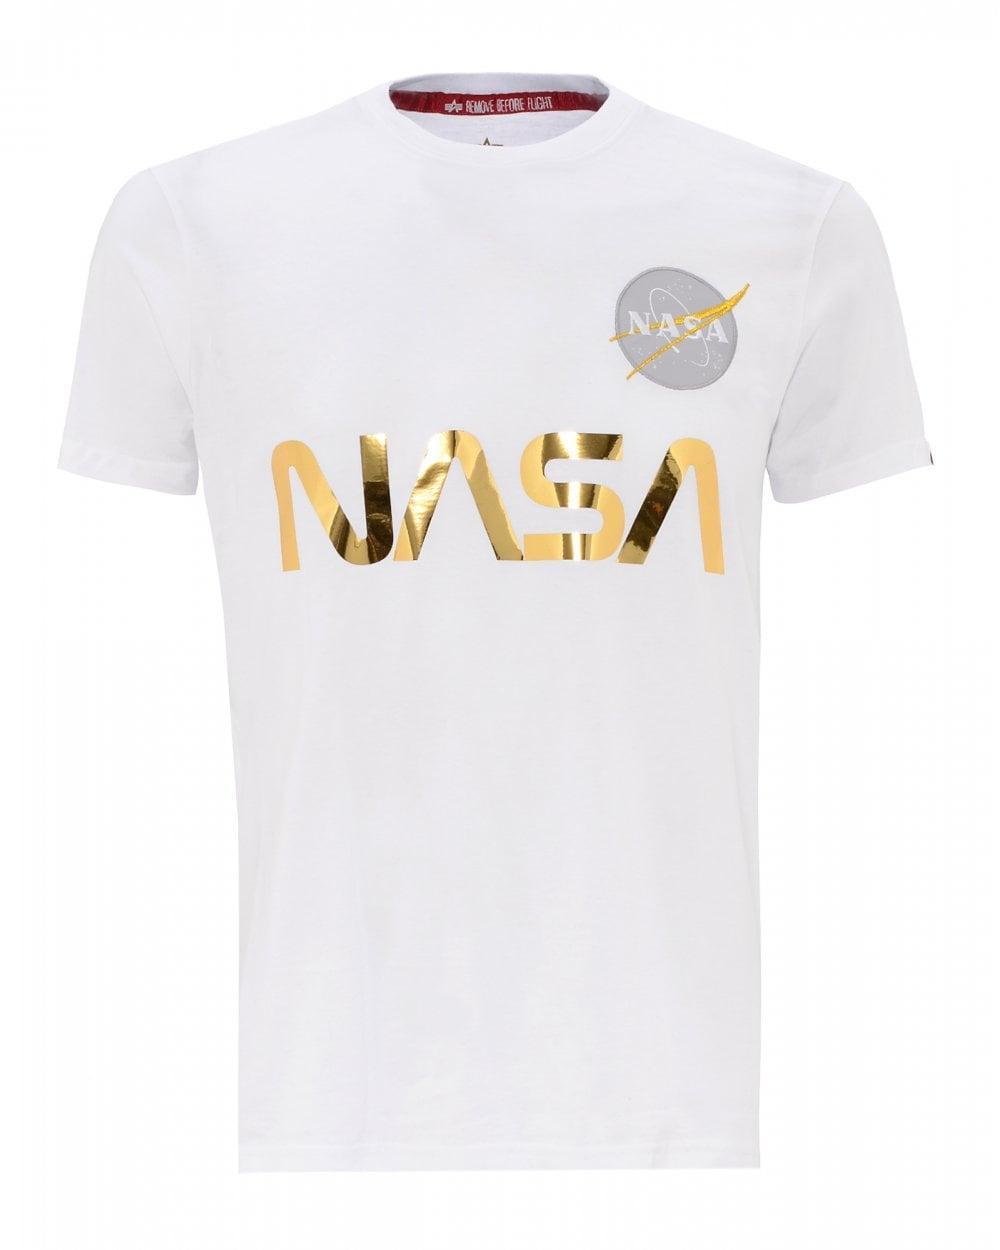 89b50a90 Alpha Industries Mens Nasa Reflective T-Shirt, Regular Fit White Tee